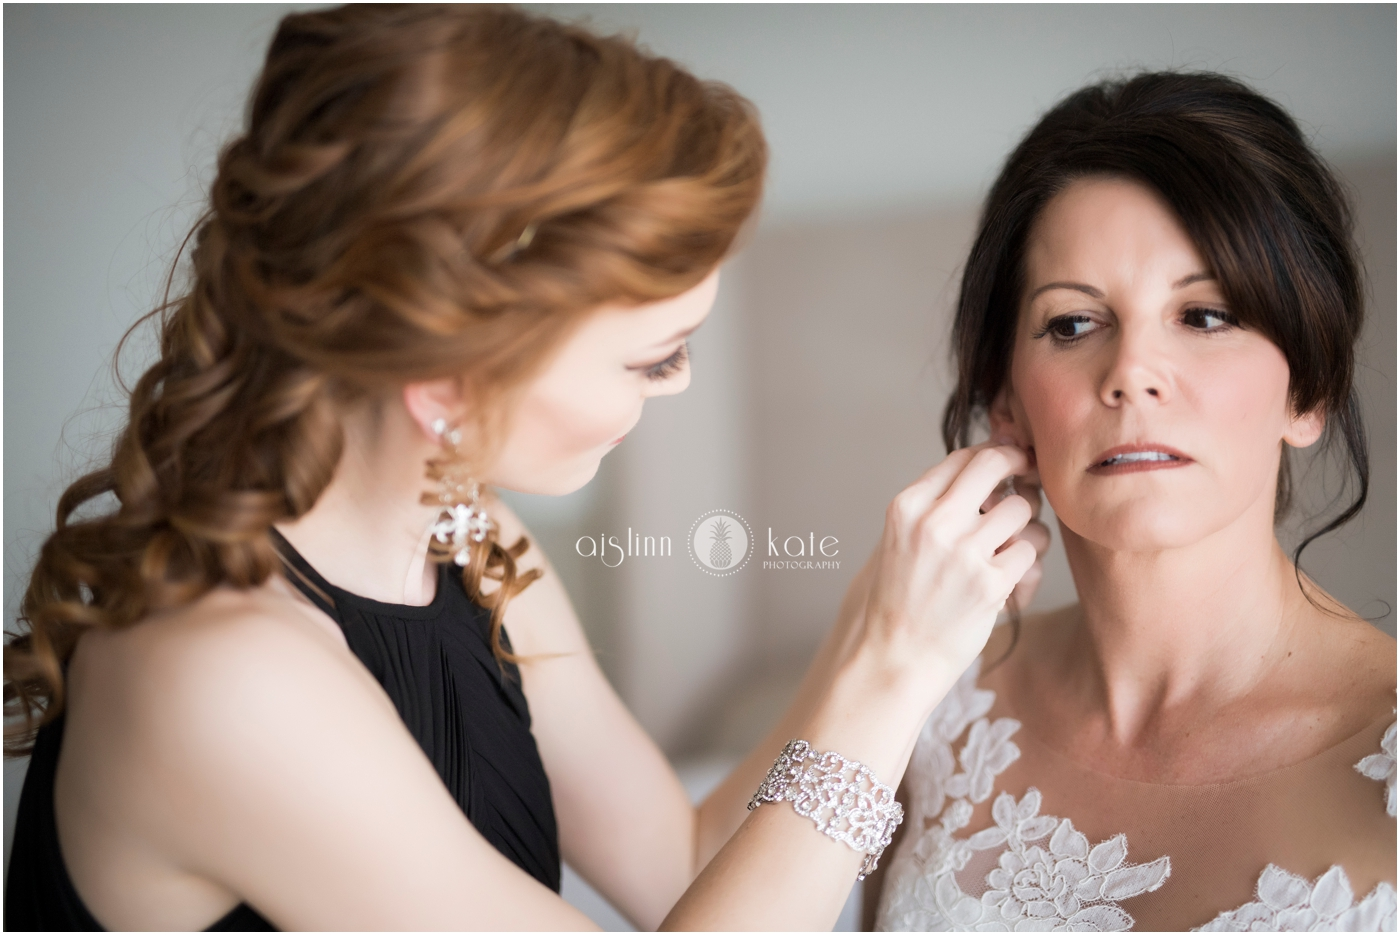 Pensacola-Destin-Wedding-Photographer_9447.jpg